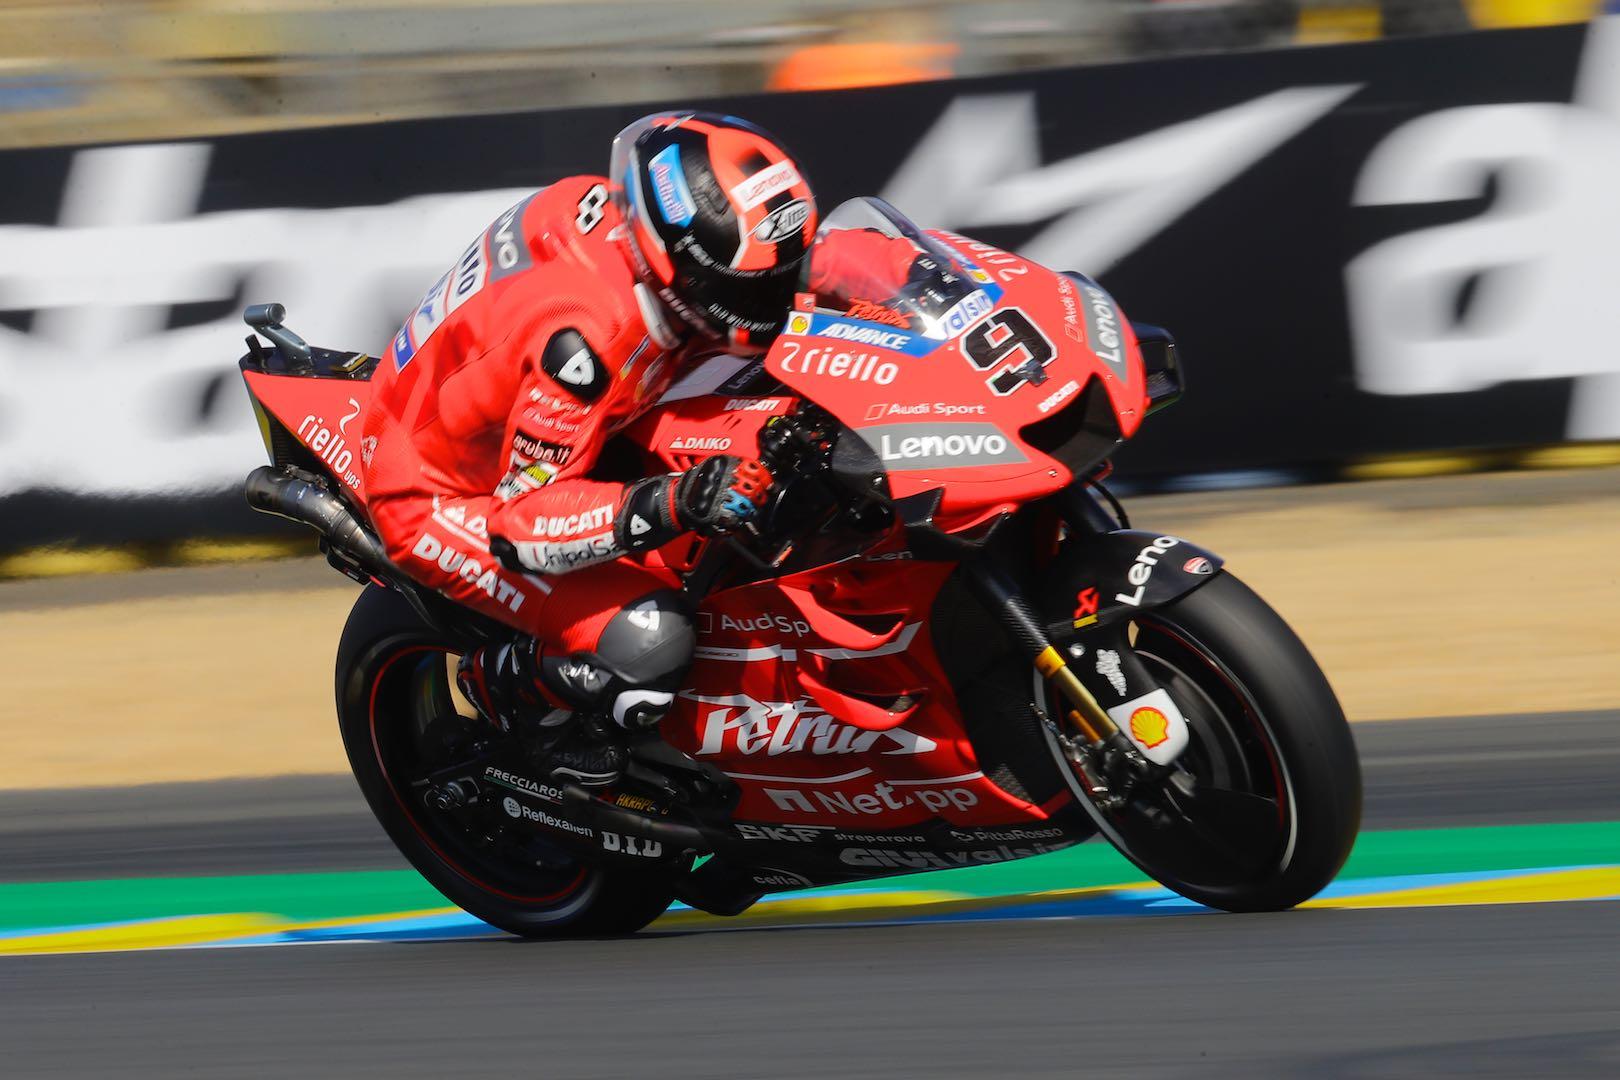 2019 Le Mans MotoGP Qualifying: Marquez on Pole; Equals Rossi's Record Ducati Petrucci